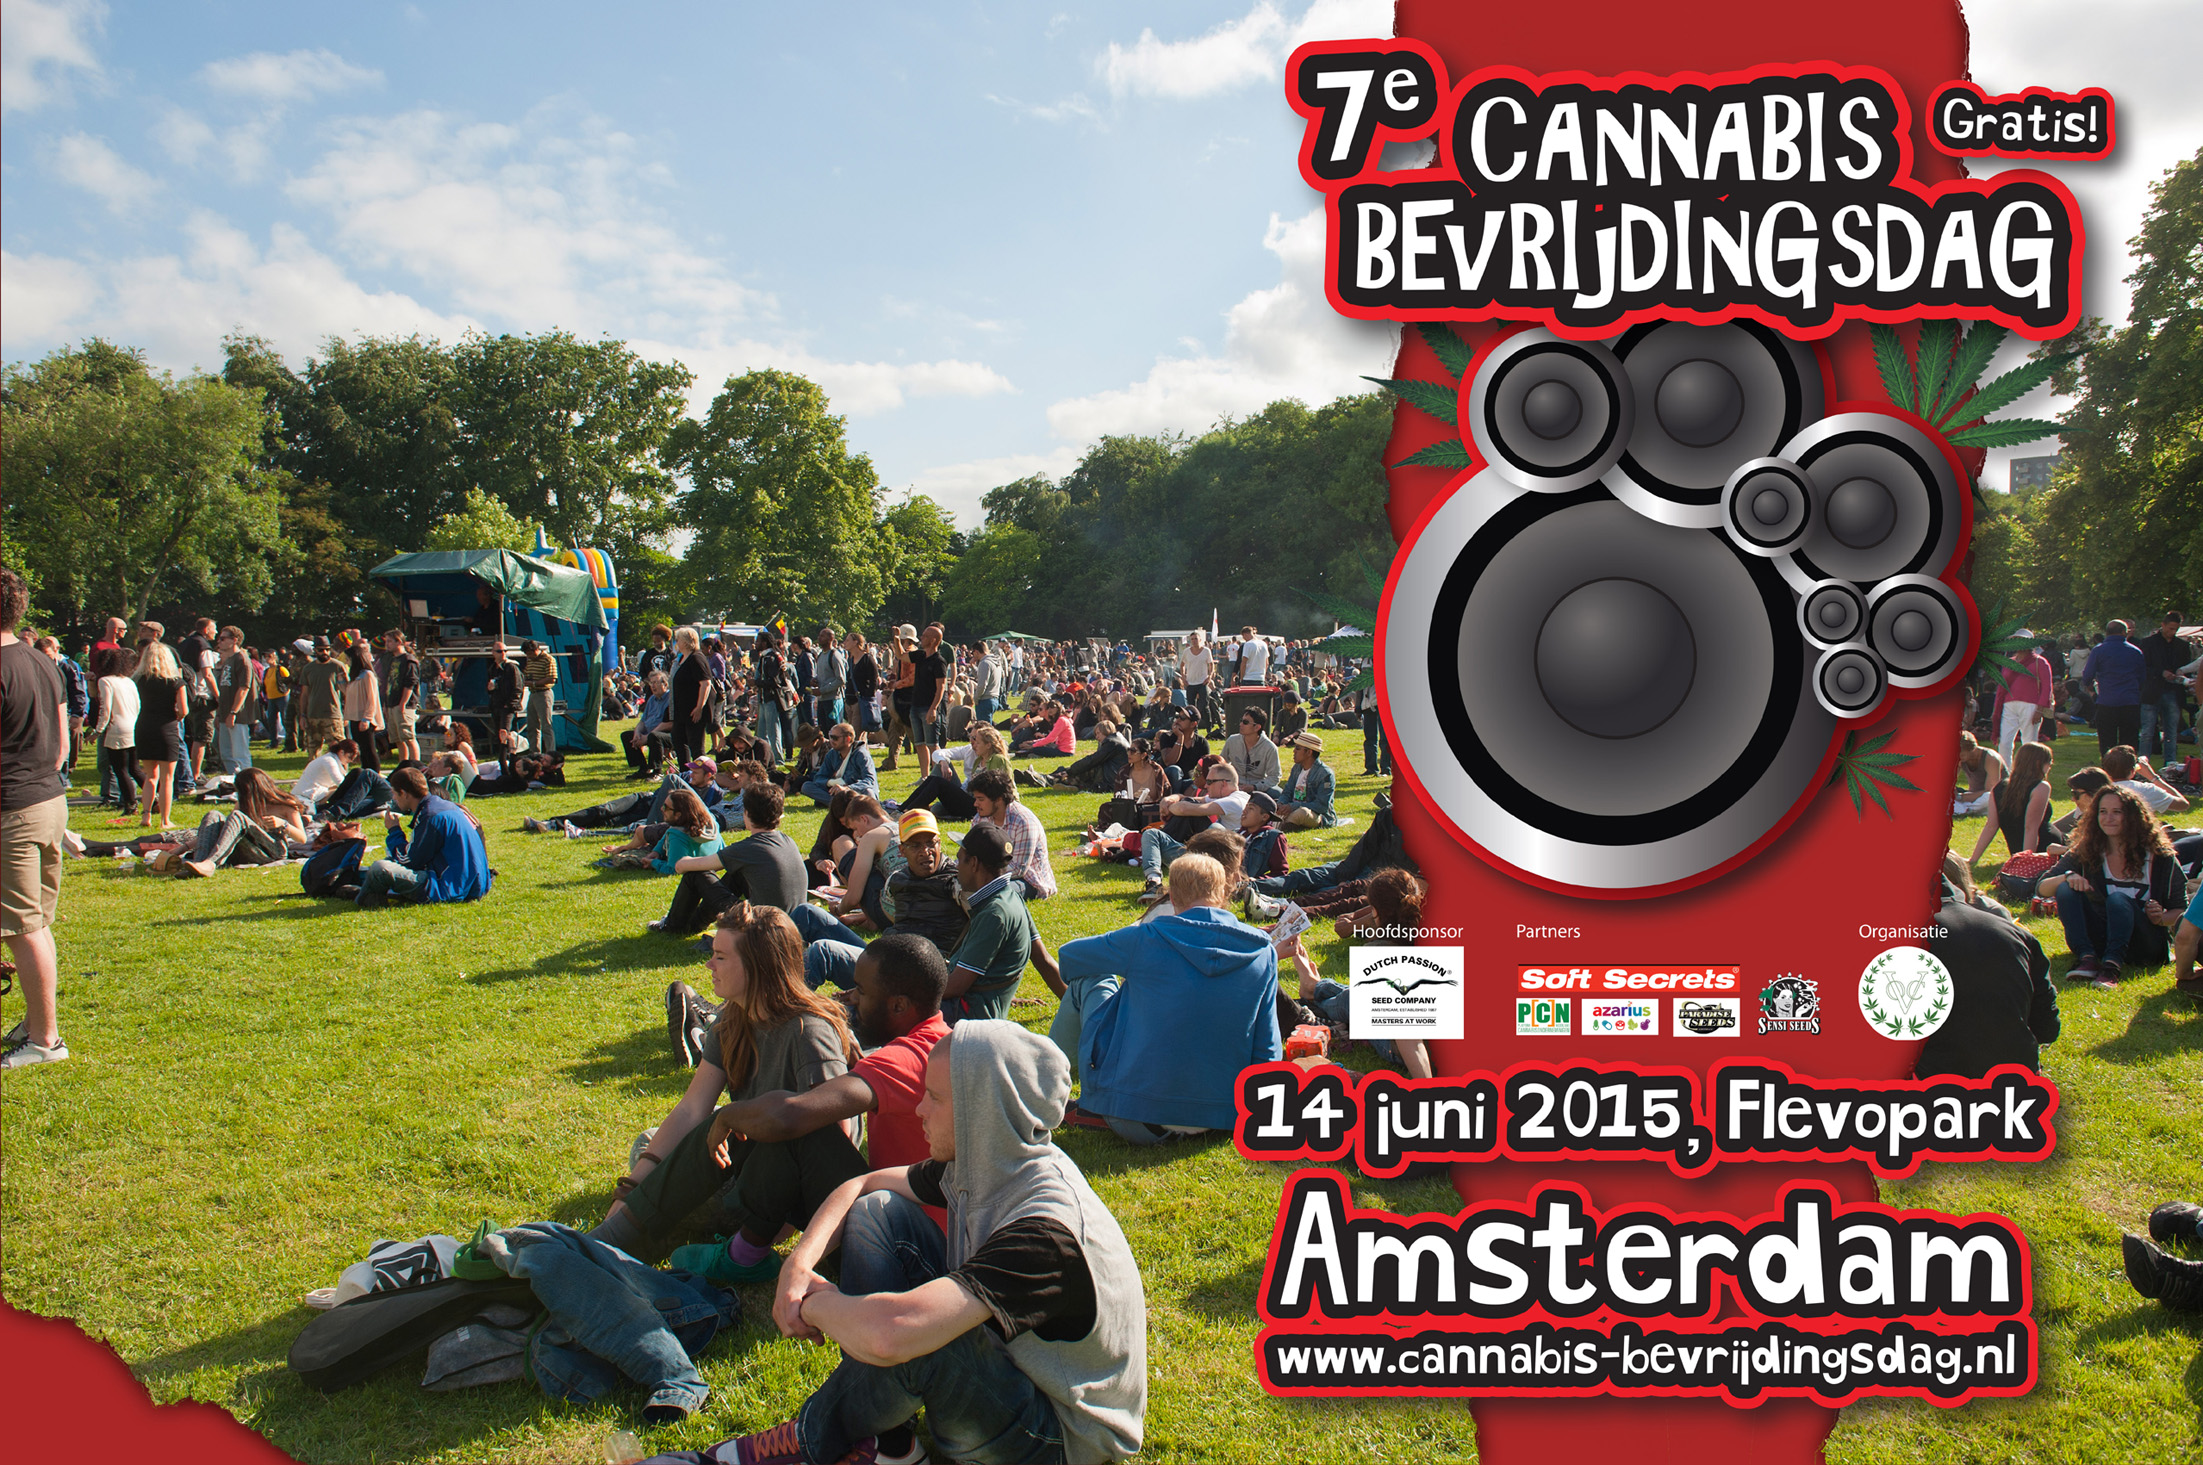 http://www.dutch-passion.nl/img/nieuwsbrief_org/Advance-poster_CBD2015_def_small-3.jpg